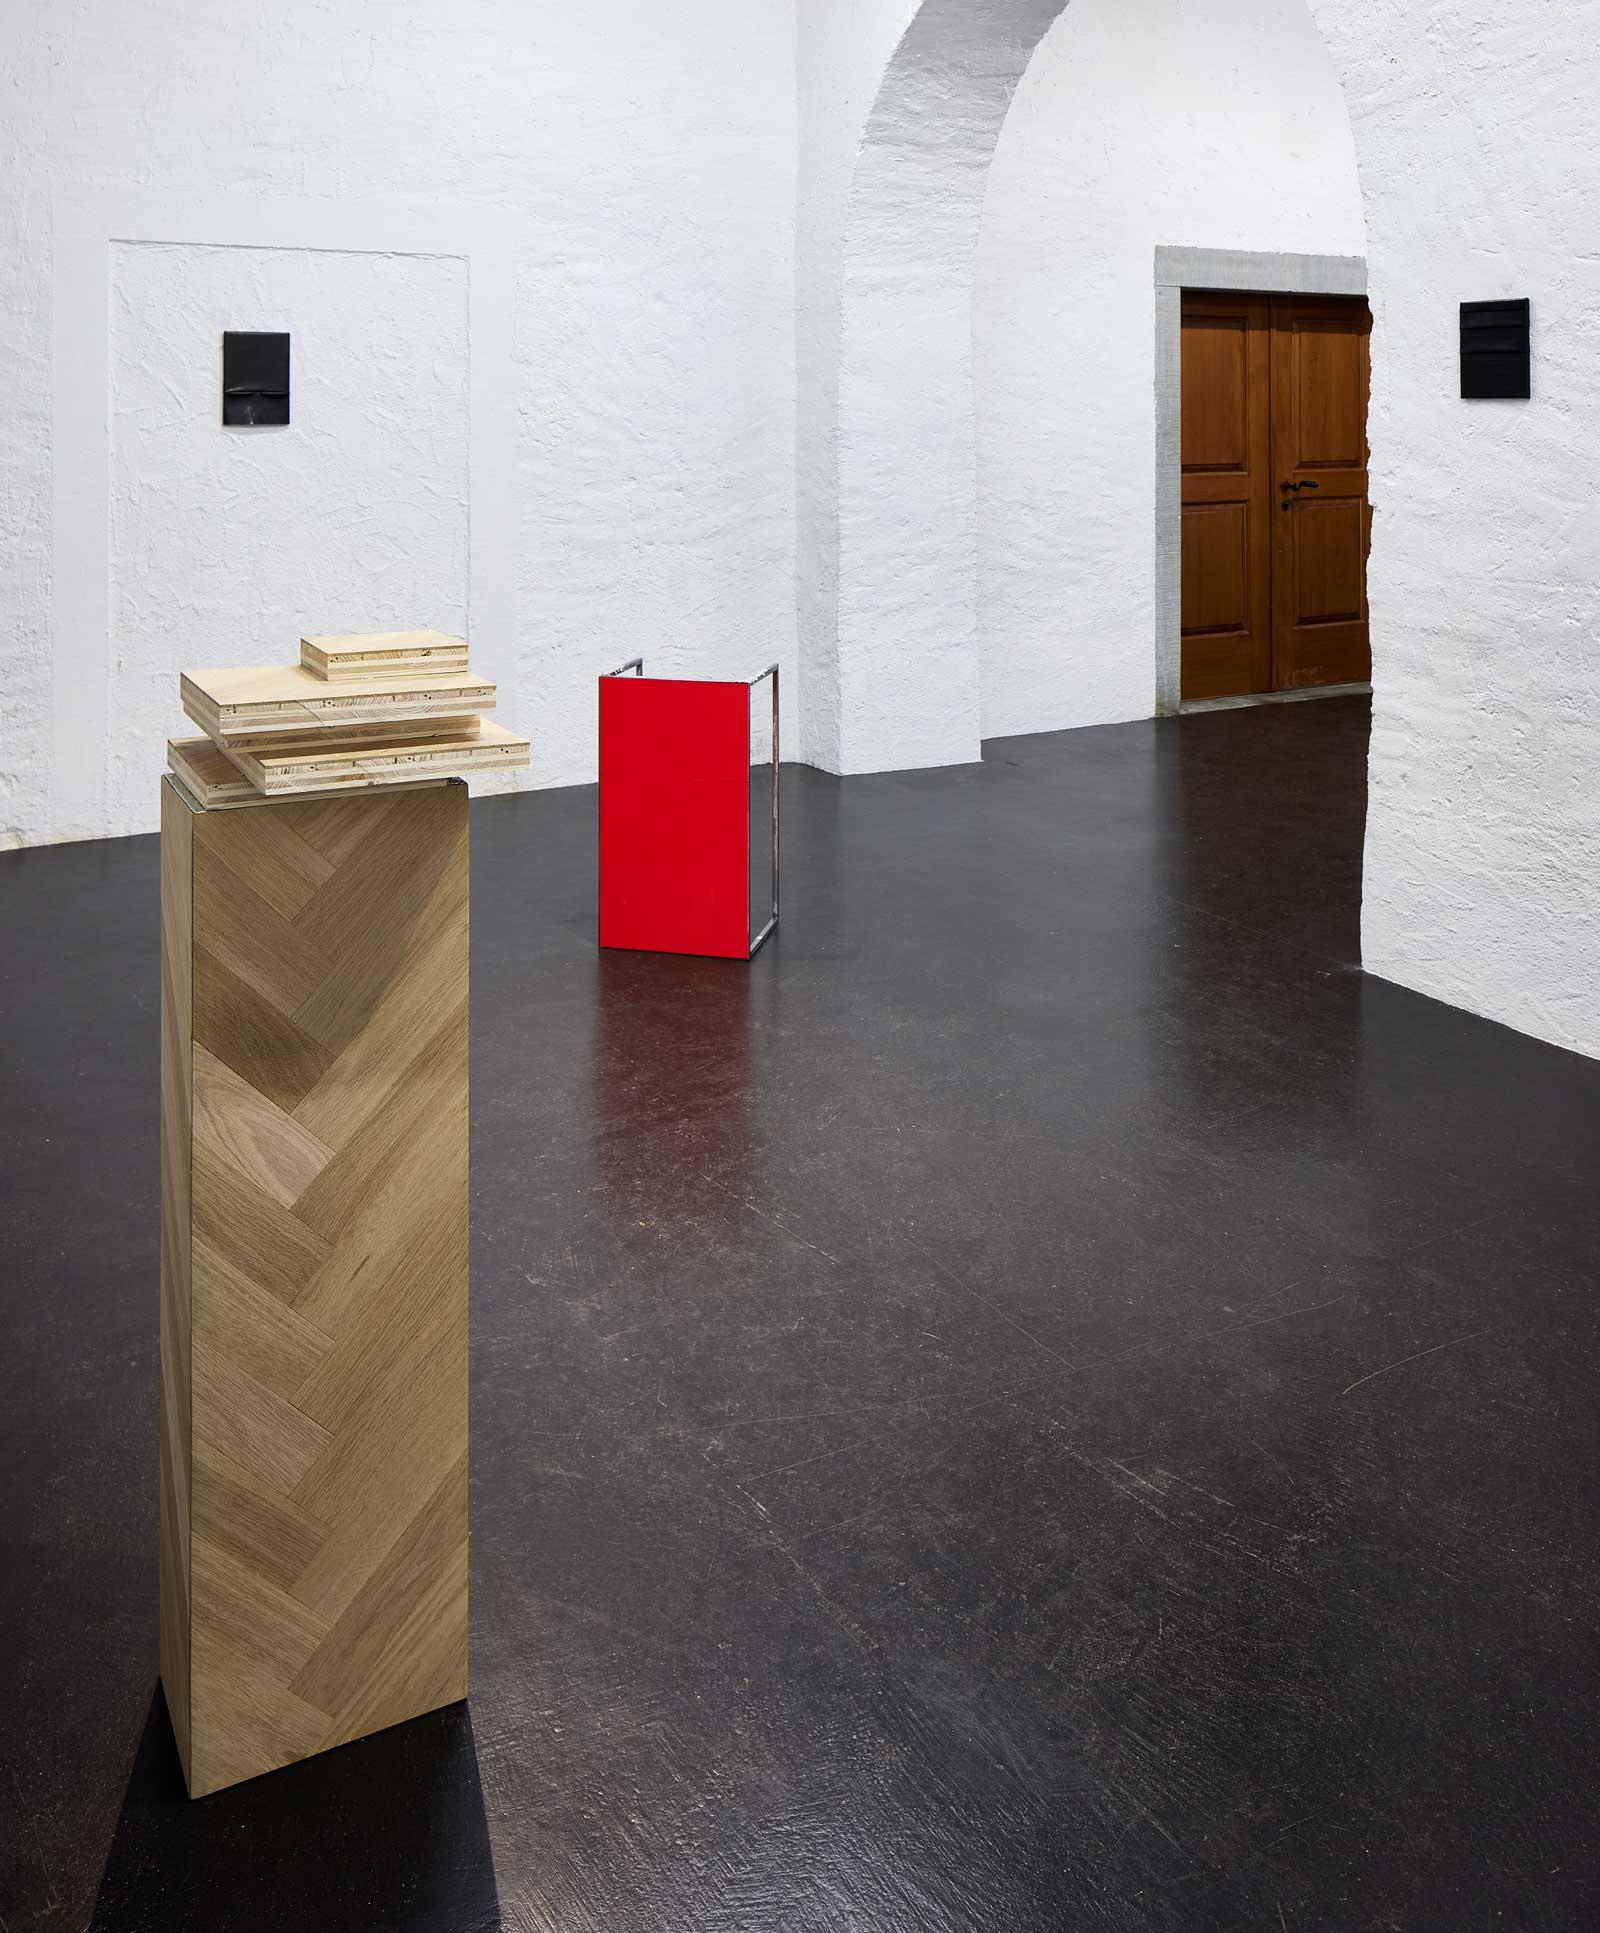 tears-of-tin_exhibition-view_LUKA-JANA-BERCHTOLD_21-03-10_007_Angela-Lamprecht